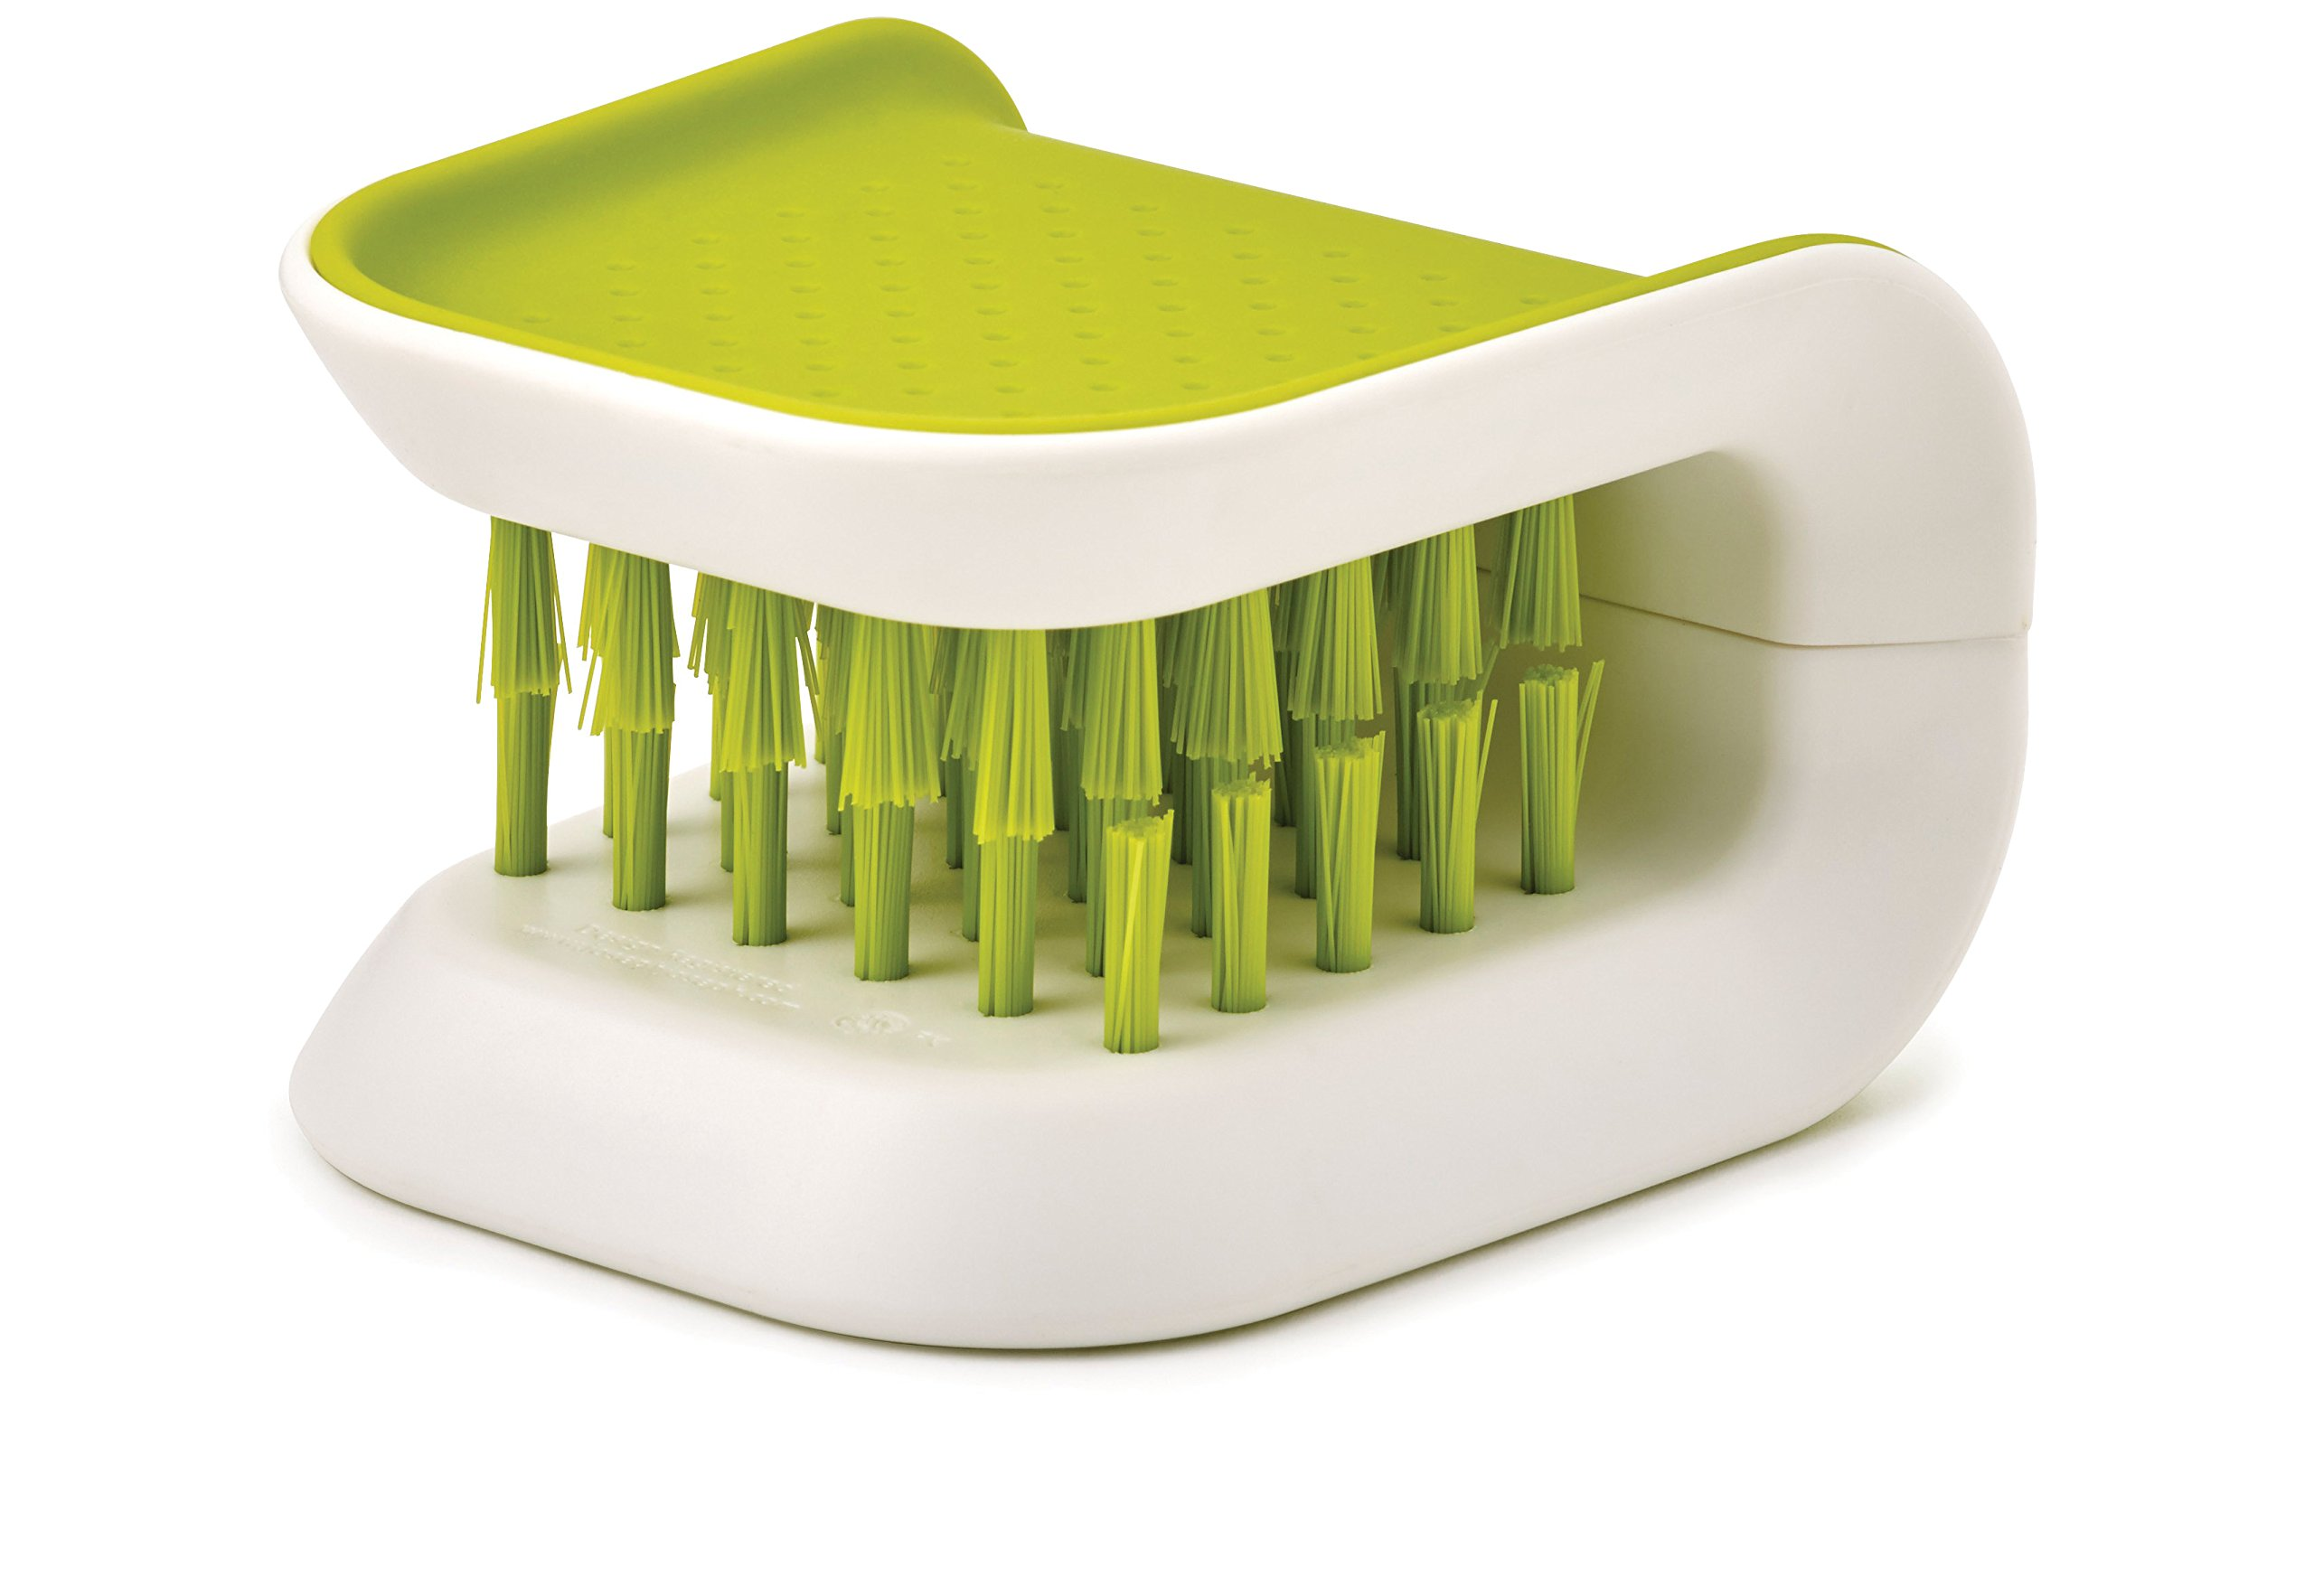 Joseph Joseph 85105 BladeBrush Knife and Cutlery Cleaner Brush Bristle Scrub Kitchen Washing Non-Slip, Green